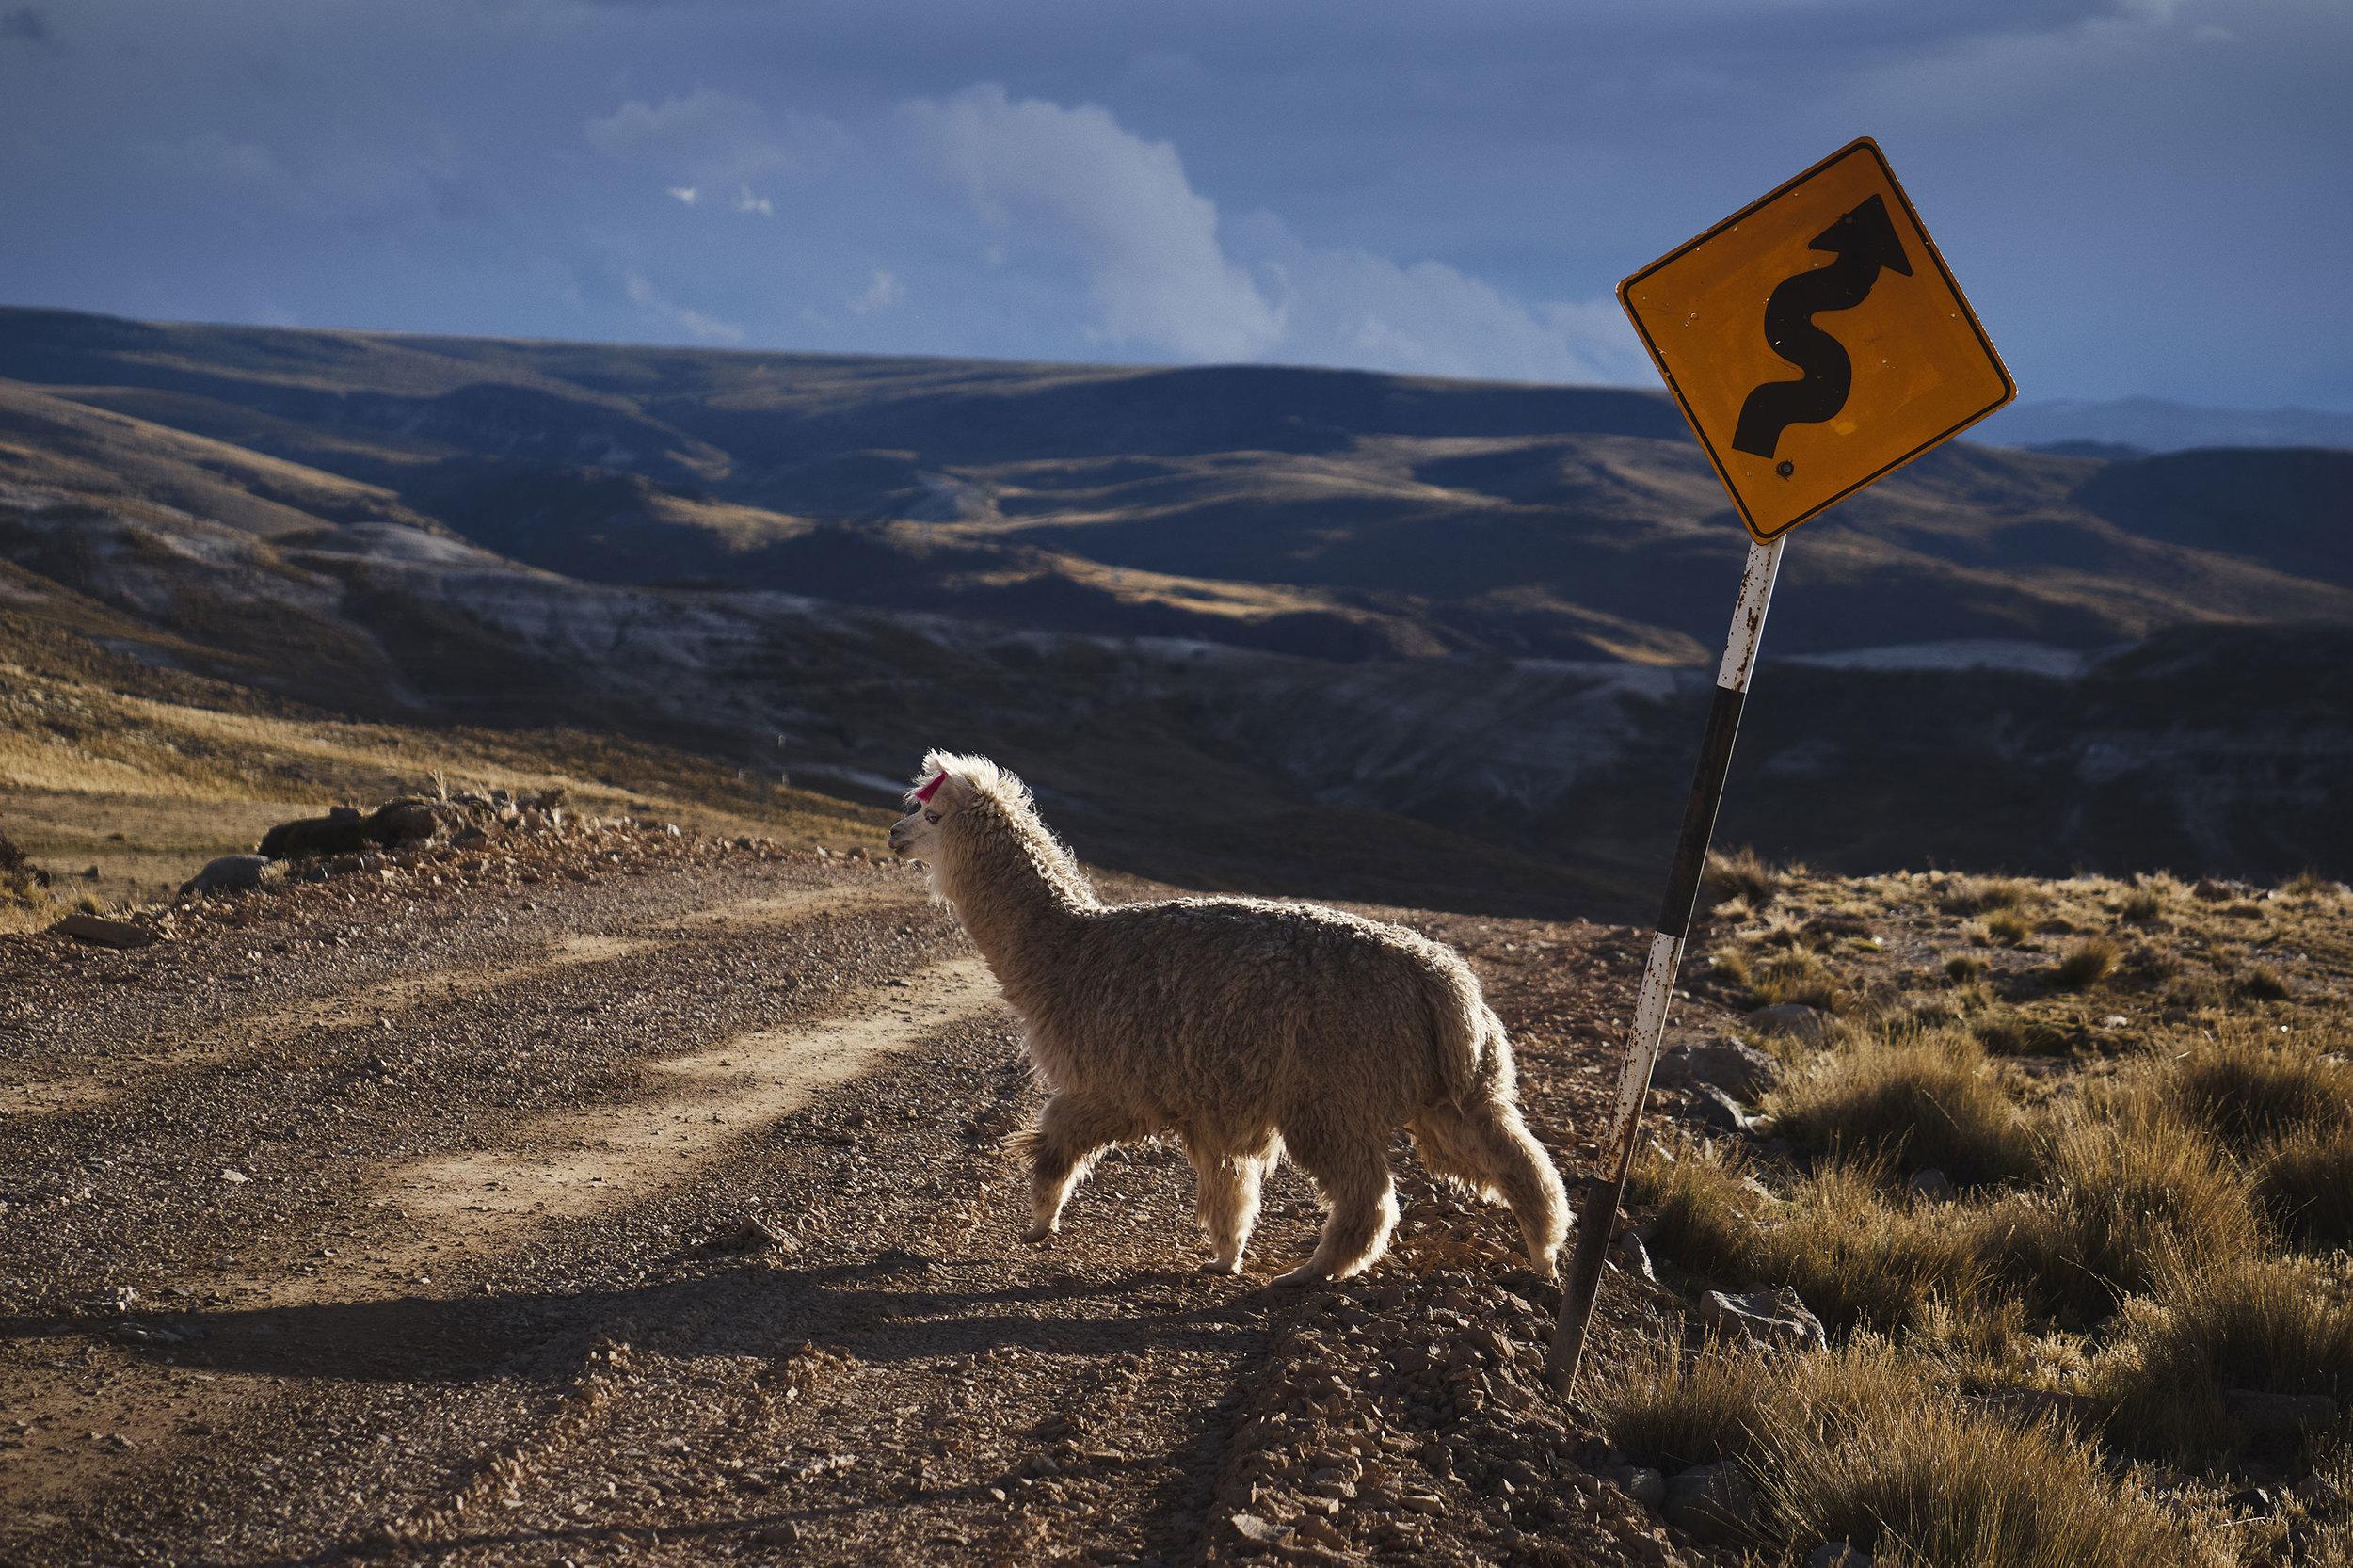 Lama crossing the road Peru